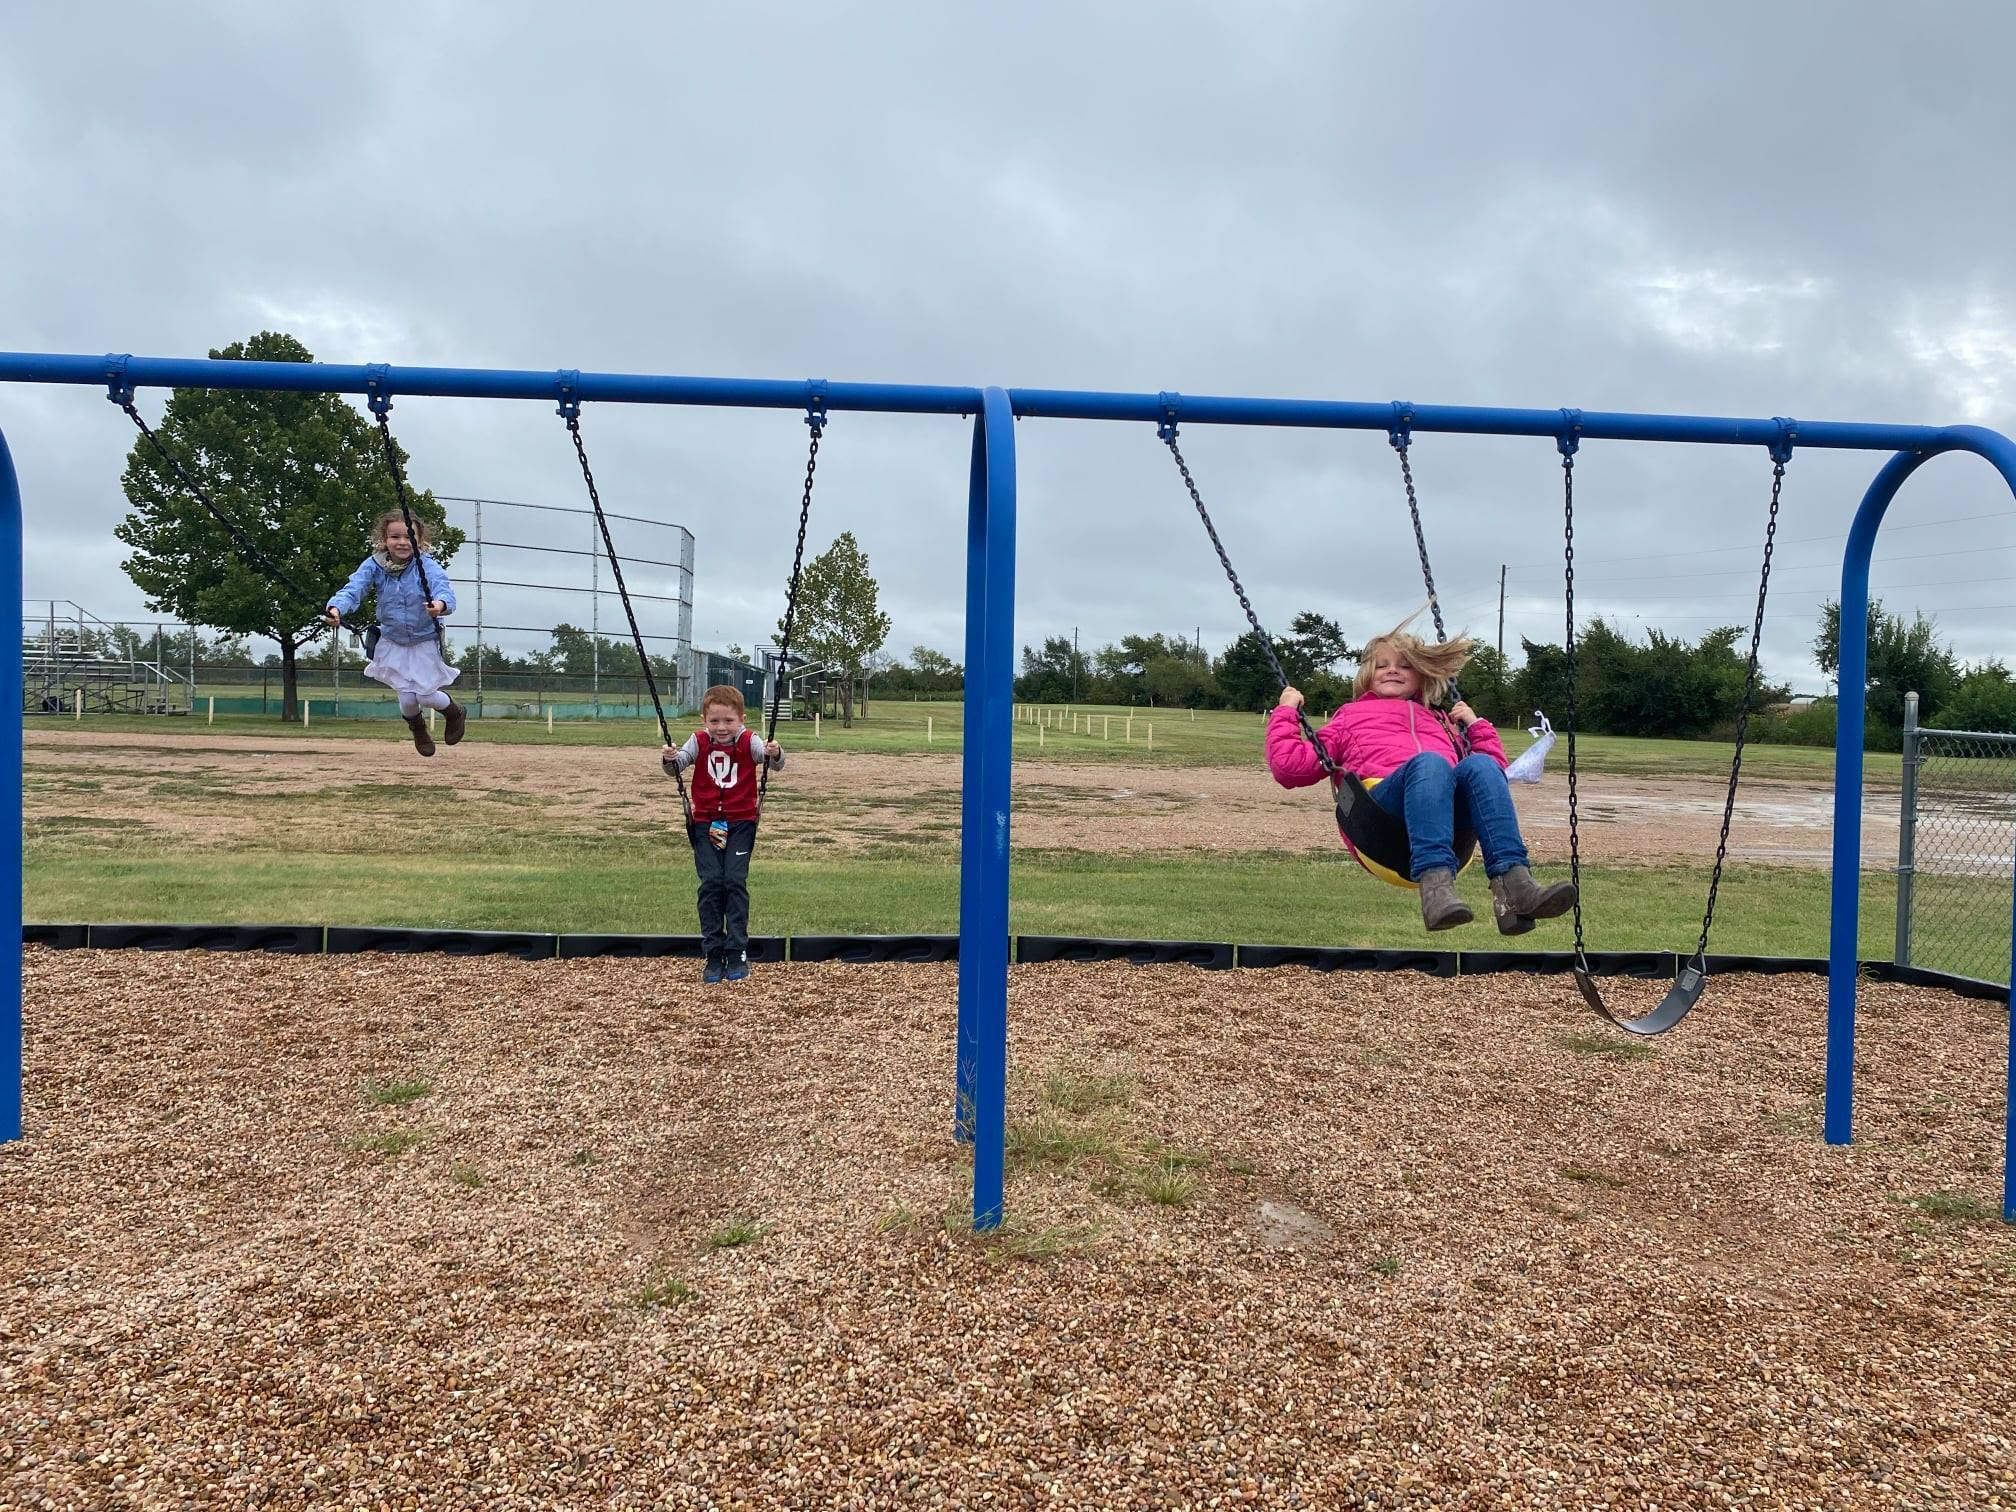 Kids Swinging on Playground